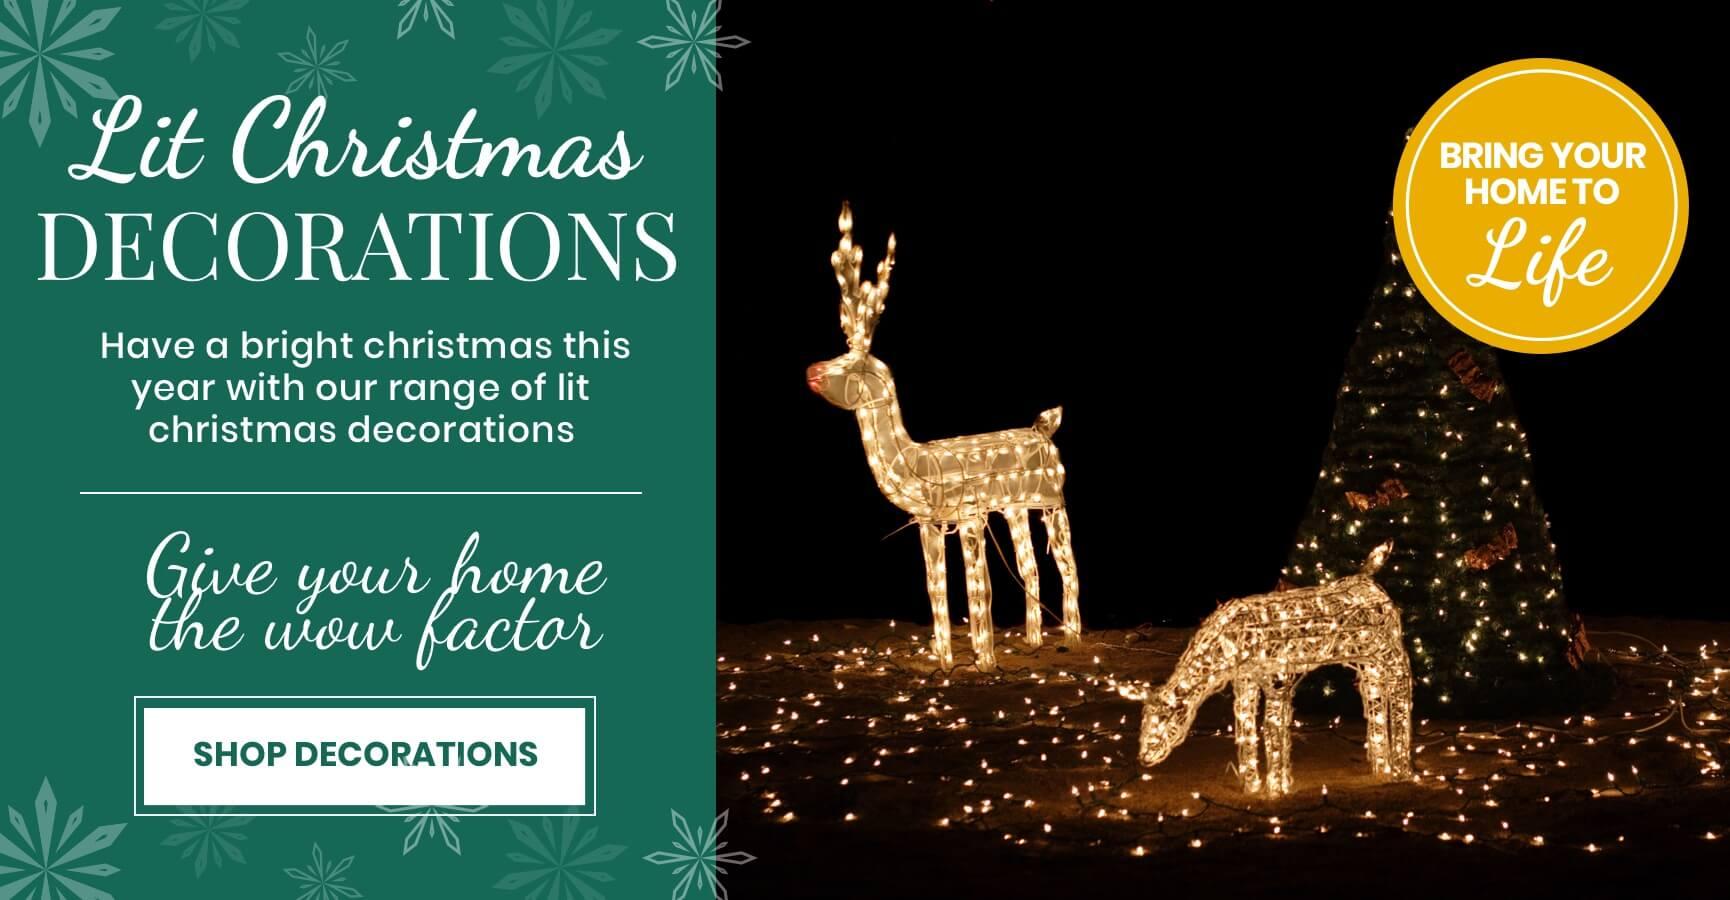 Lit Christmas Decorations